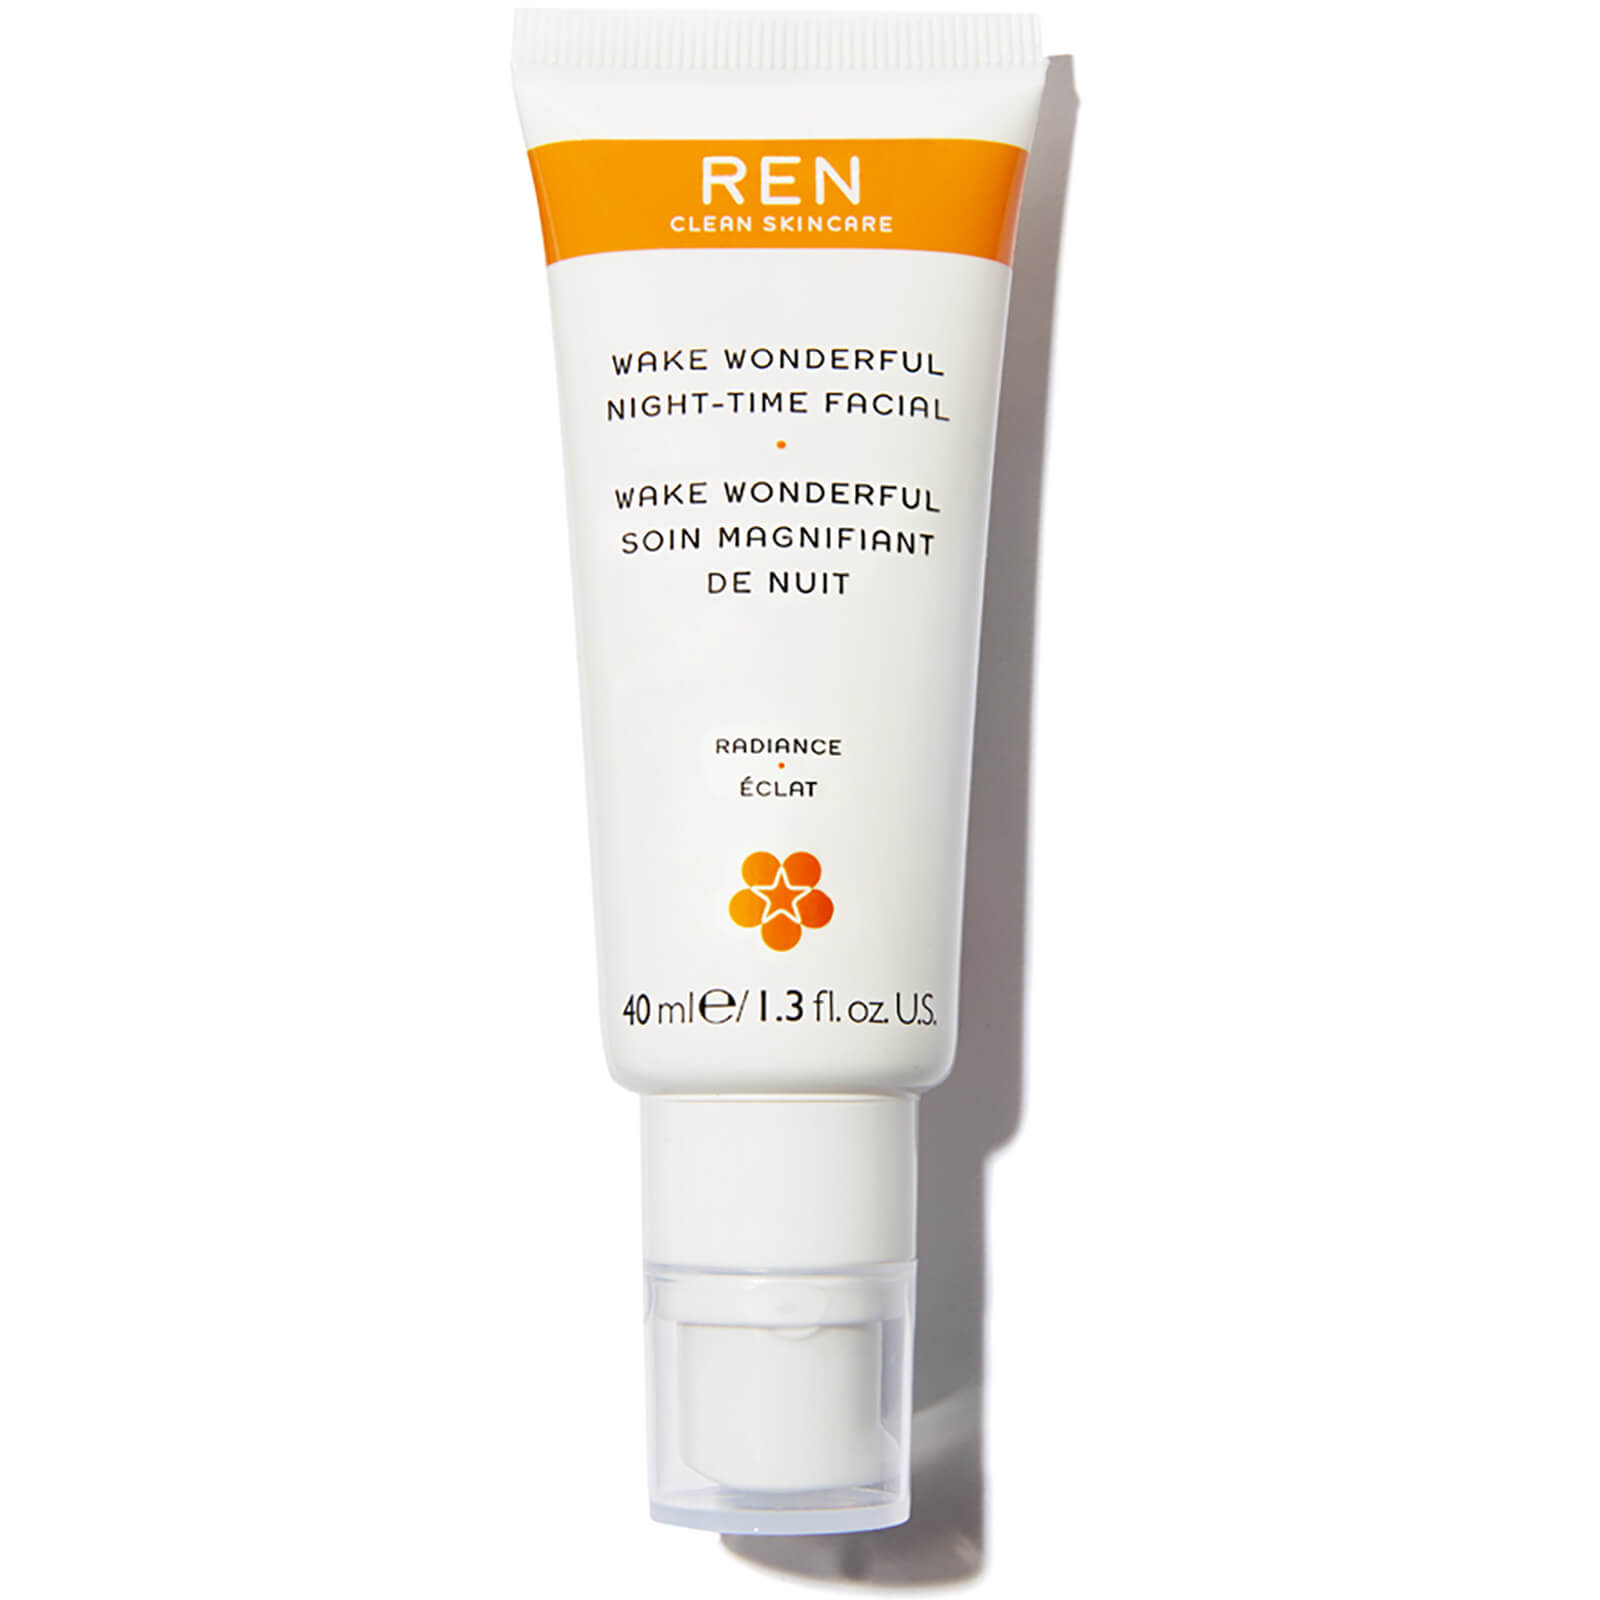 Ren Wake Wonderful Night Time Facial 40ml Beautyexpert Cottage Happy Shower Sex On The Beach 250 Ml Cranberry Product Description